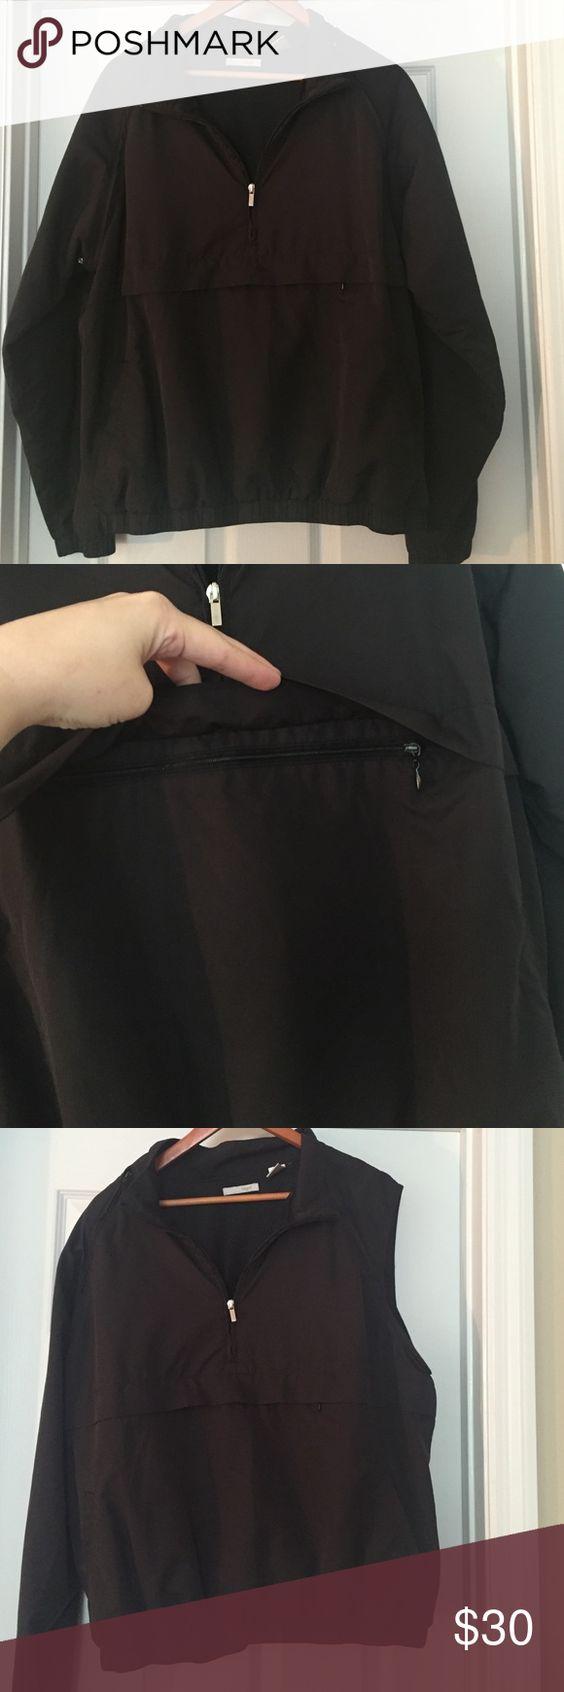 Liz Golf jacket/vest Black windbreaker jacket that converts to a vest (both sleeves zip on and off). Excellent condition. Has deep front zip pocket. Shell 100% polyester, lining 100% polyester Liz Golf Jackets & Coats